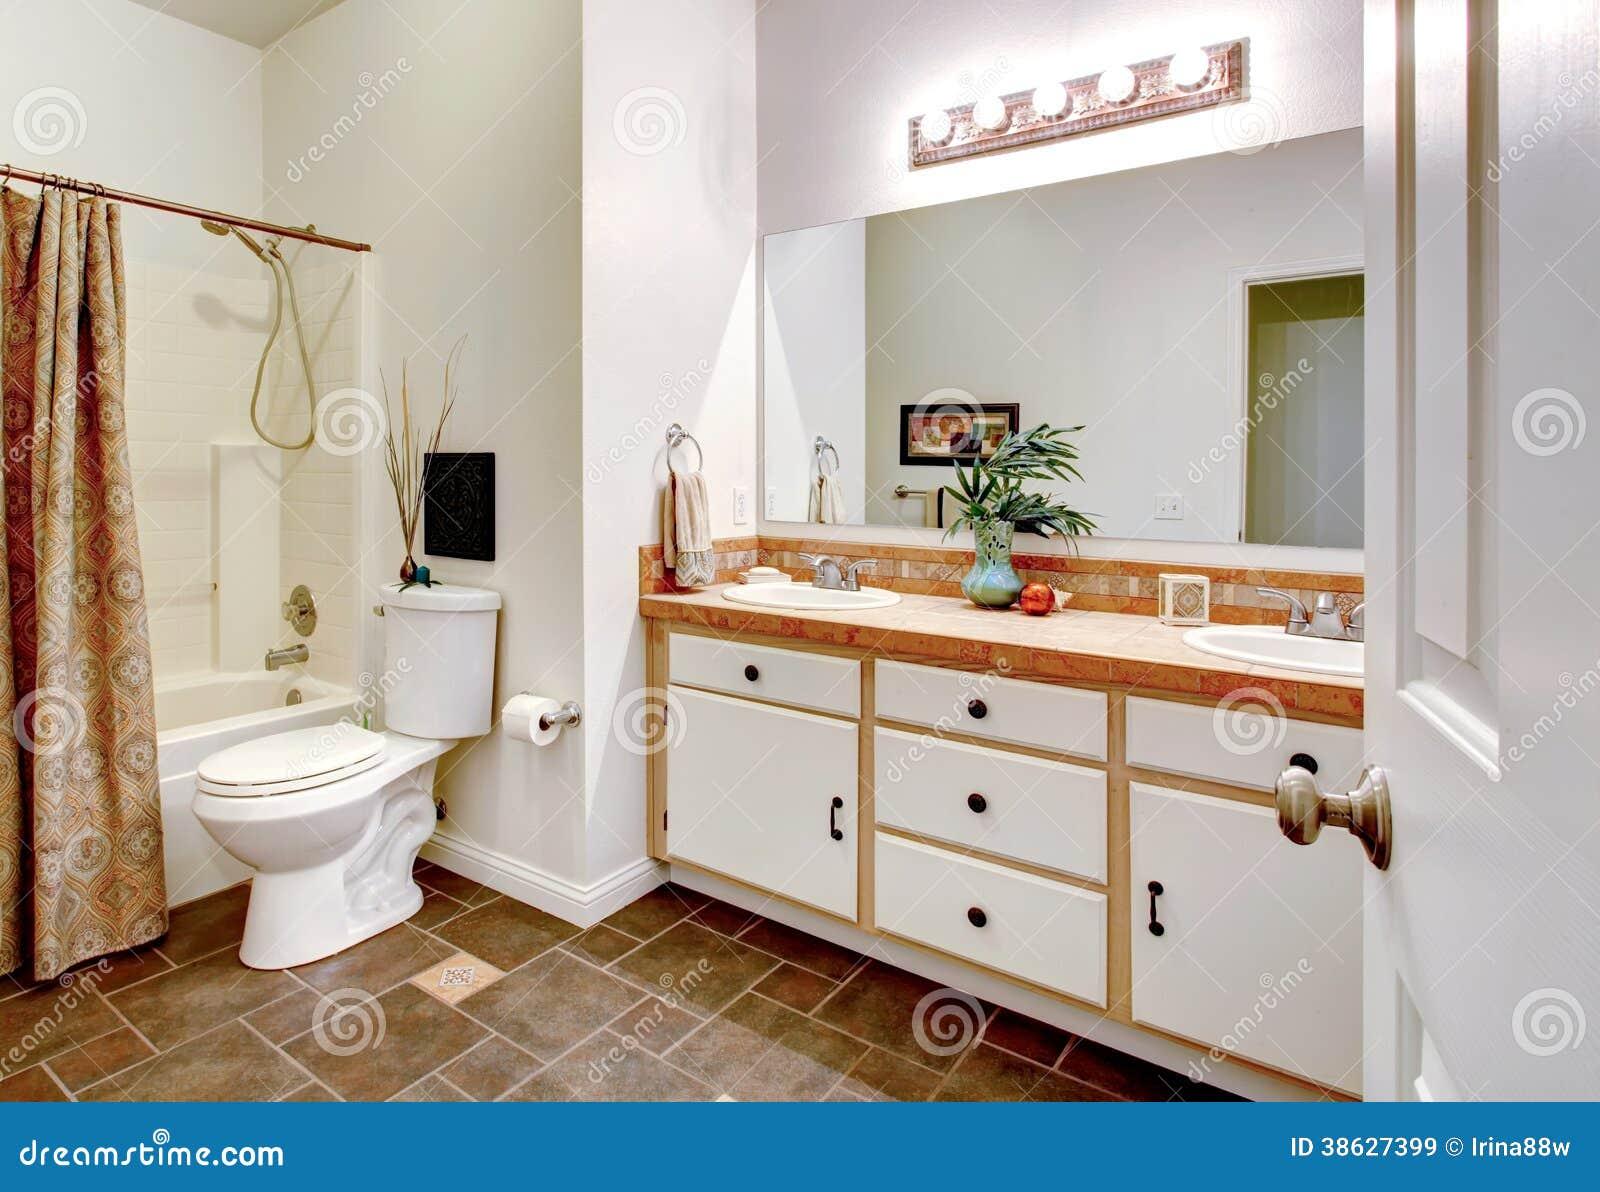 Ljust vitt badrum. royaltyfria bilder   bild: 38627399